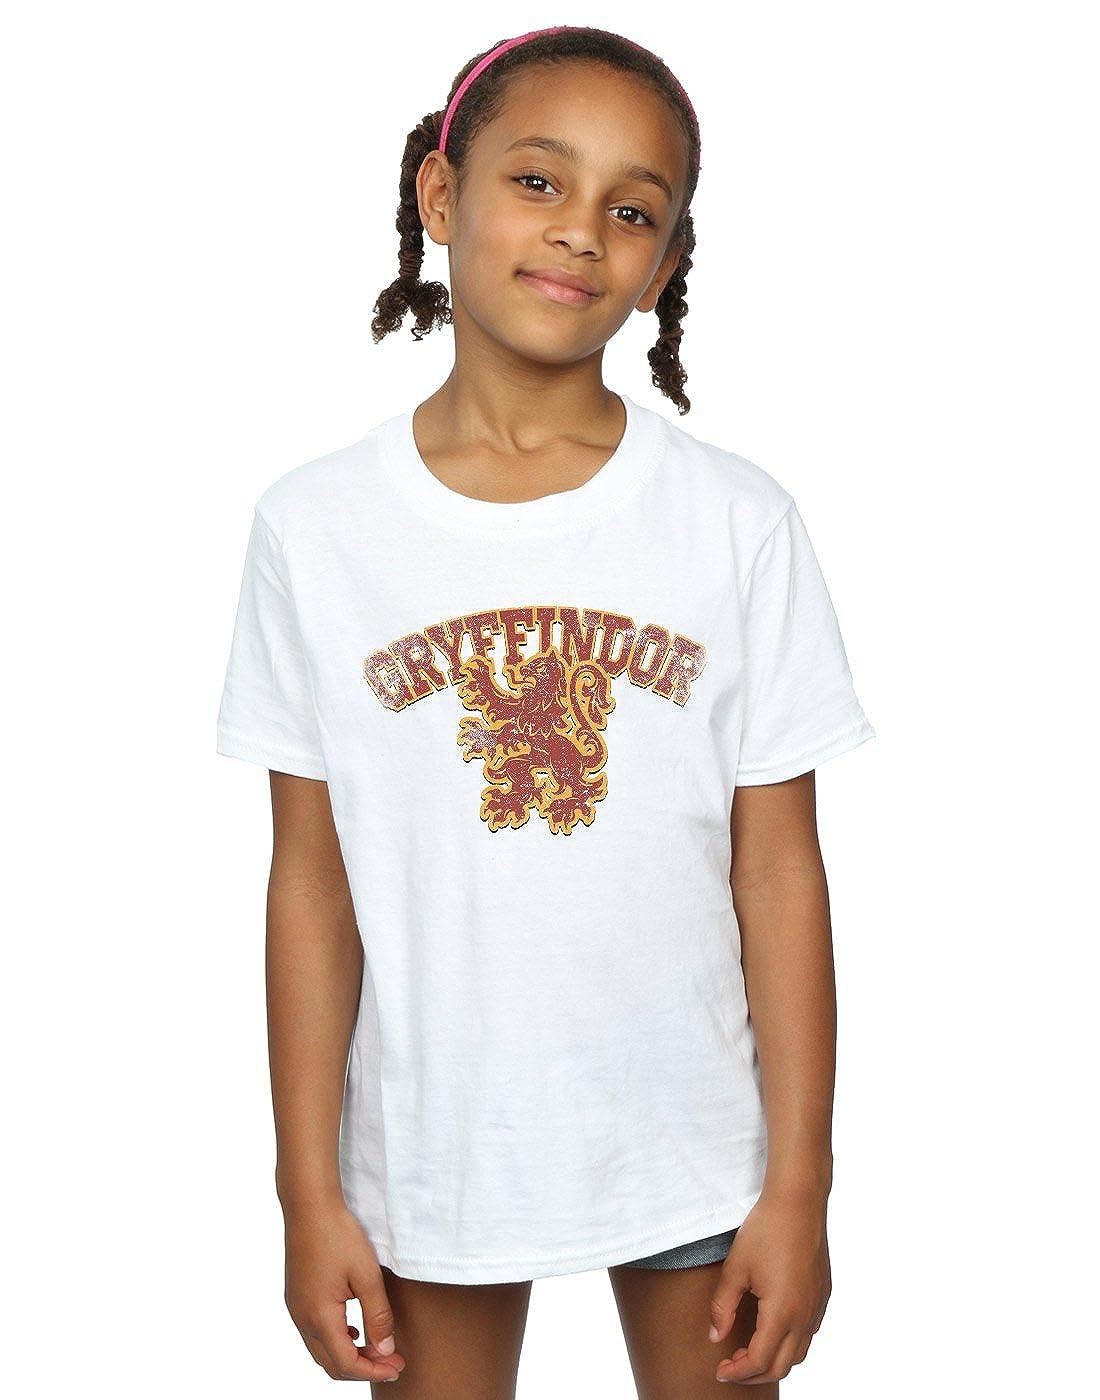 Harry Potter Girls Gryffindor Sport Emblem T-Shirt Absolute Cult